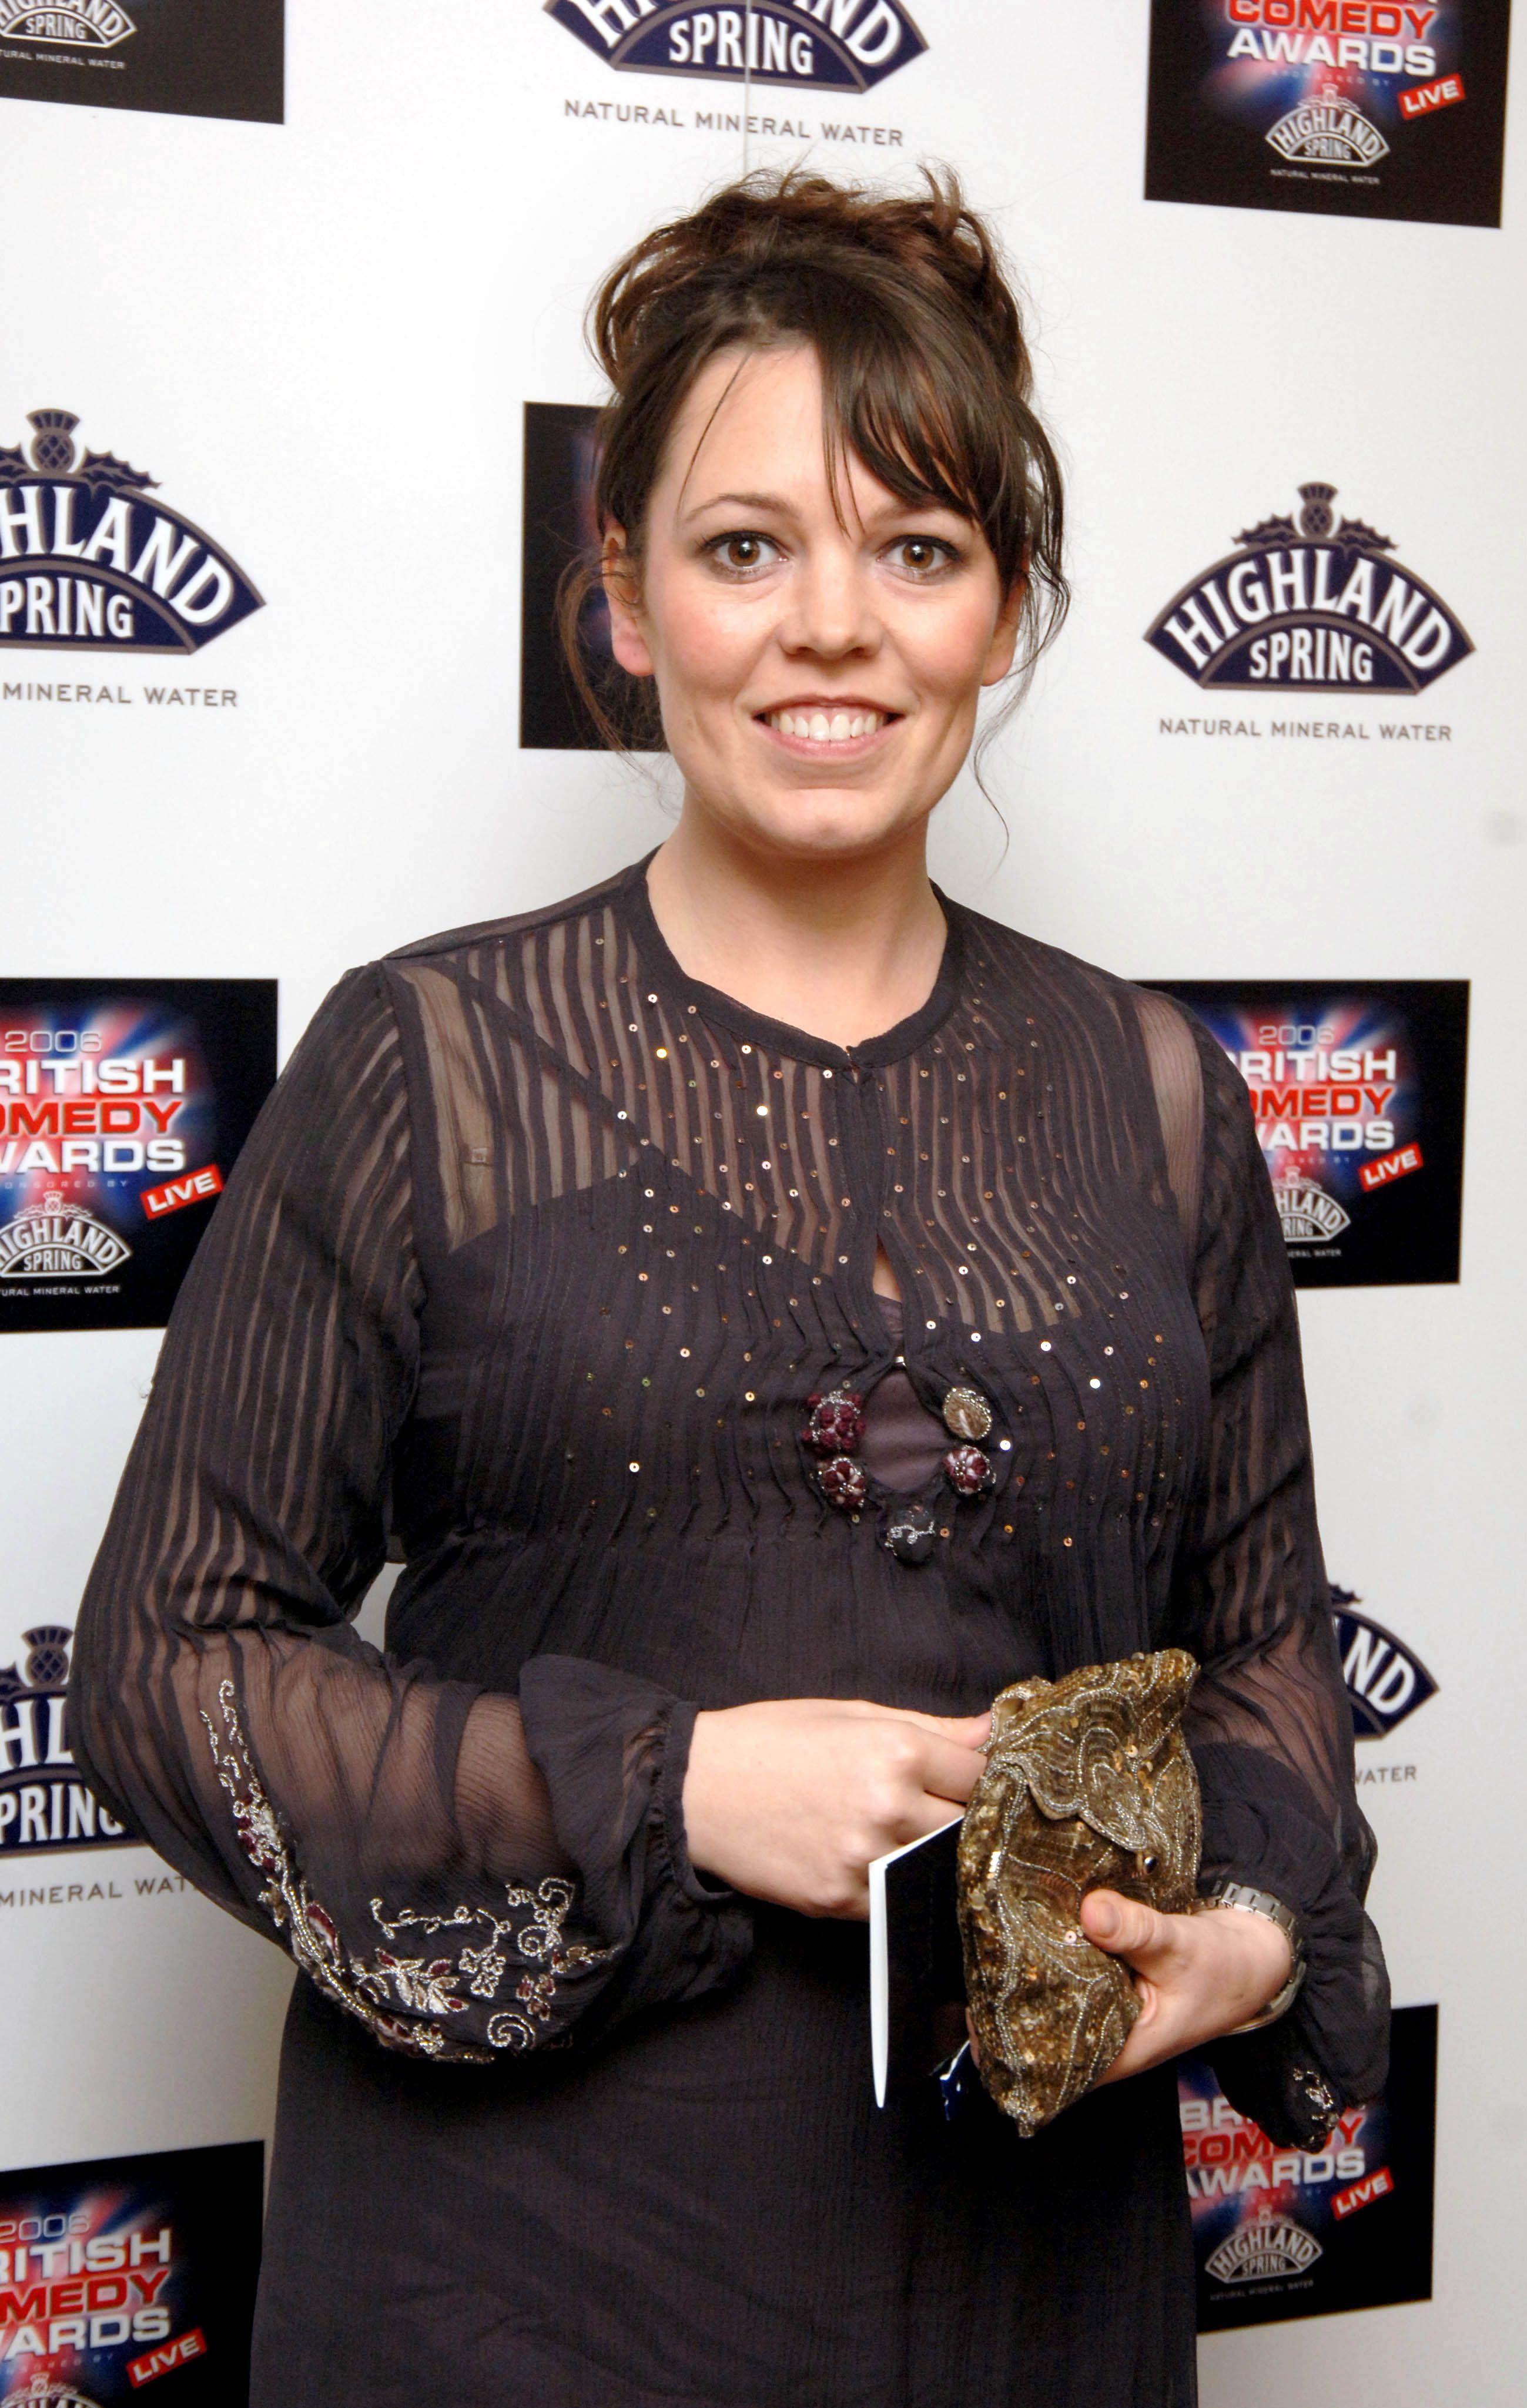 British Comedy Awards 2006 - London